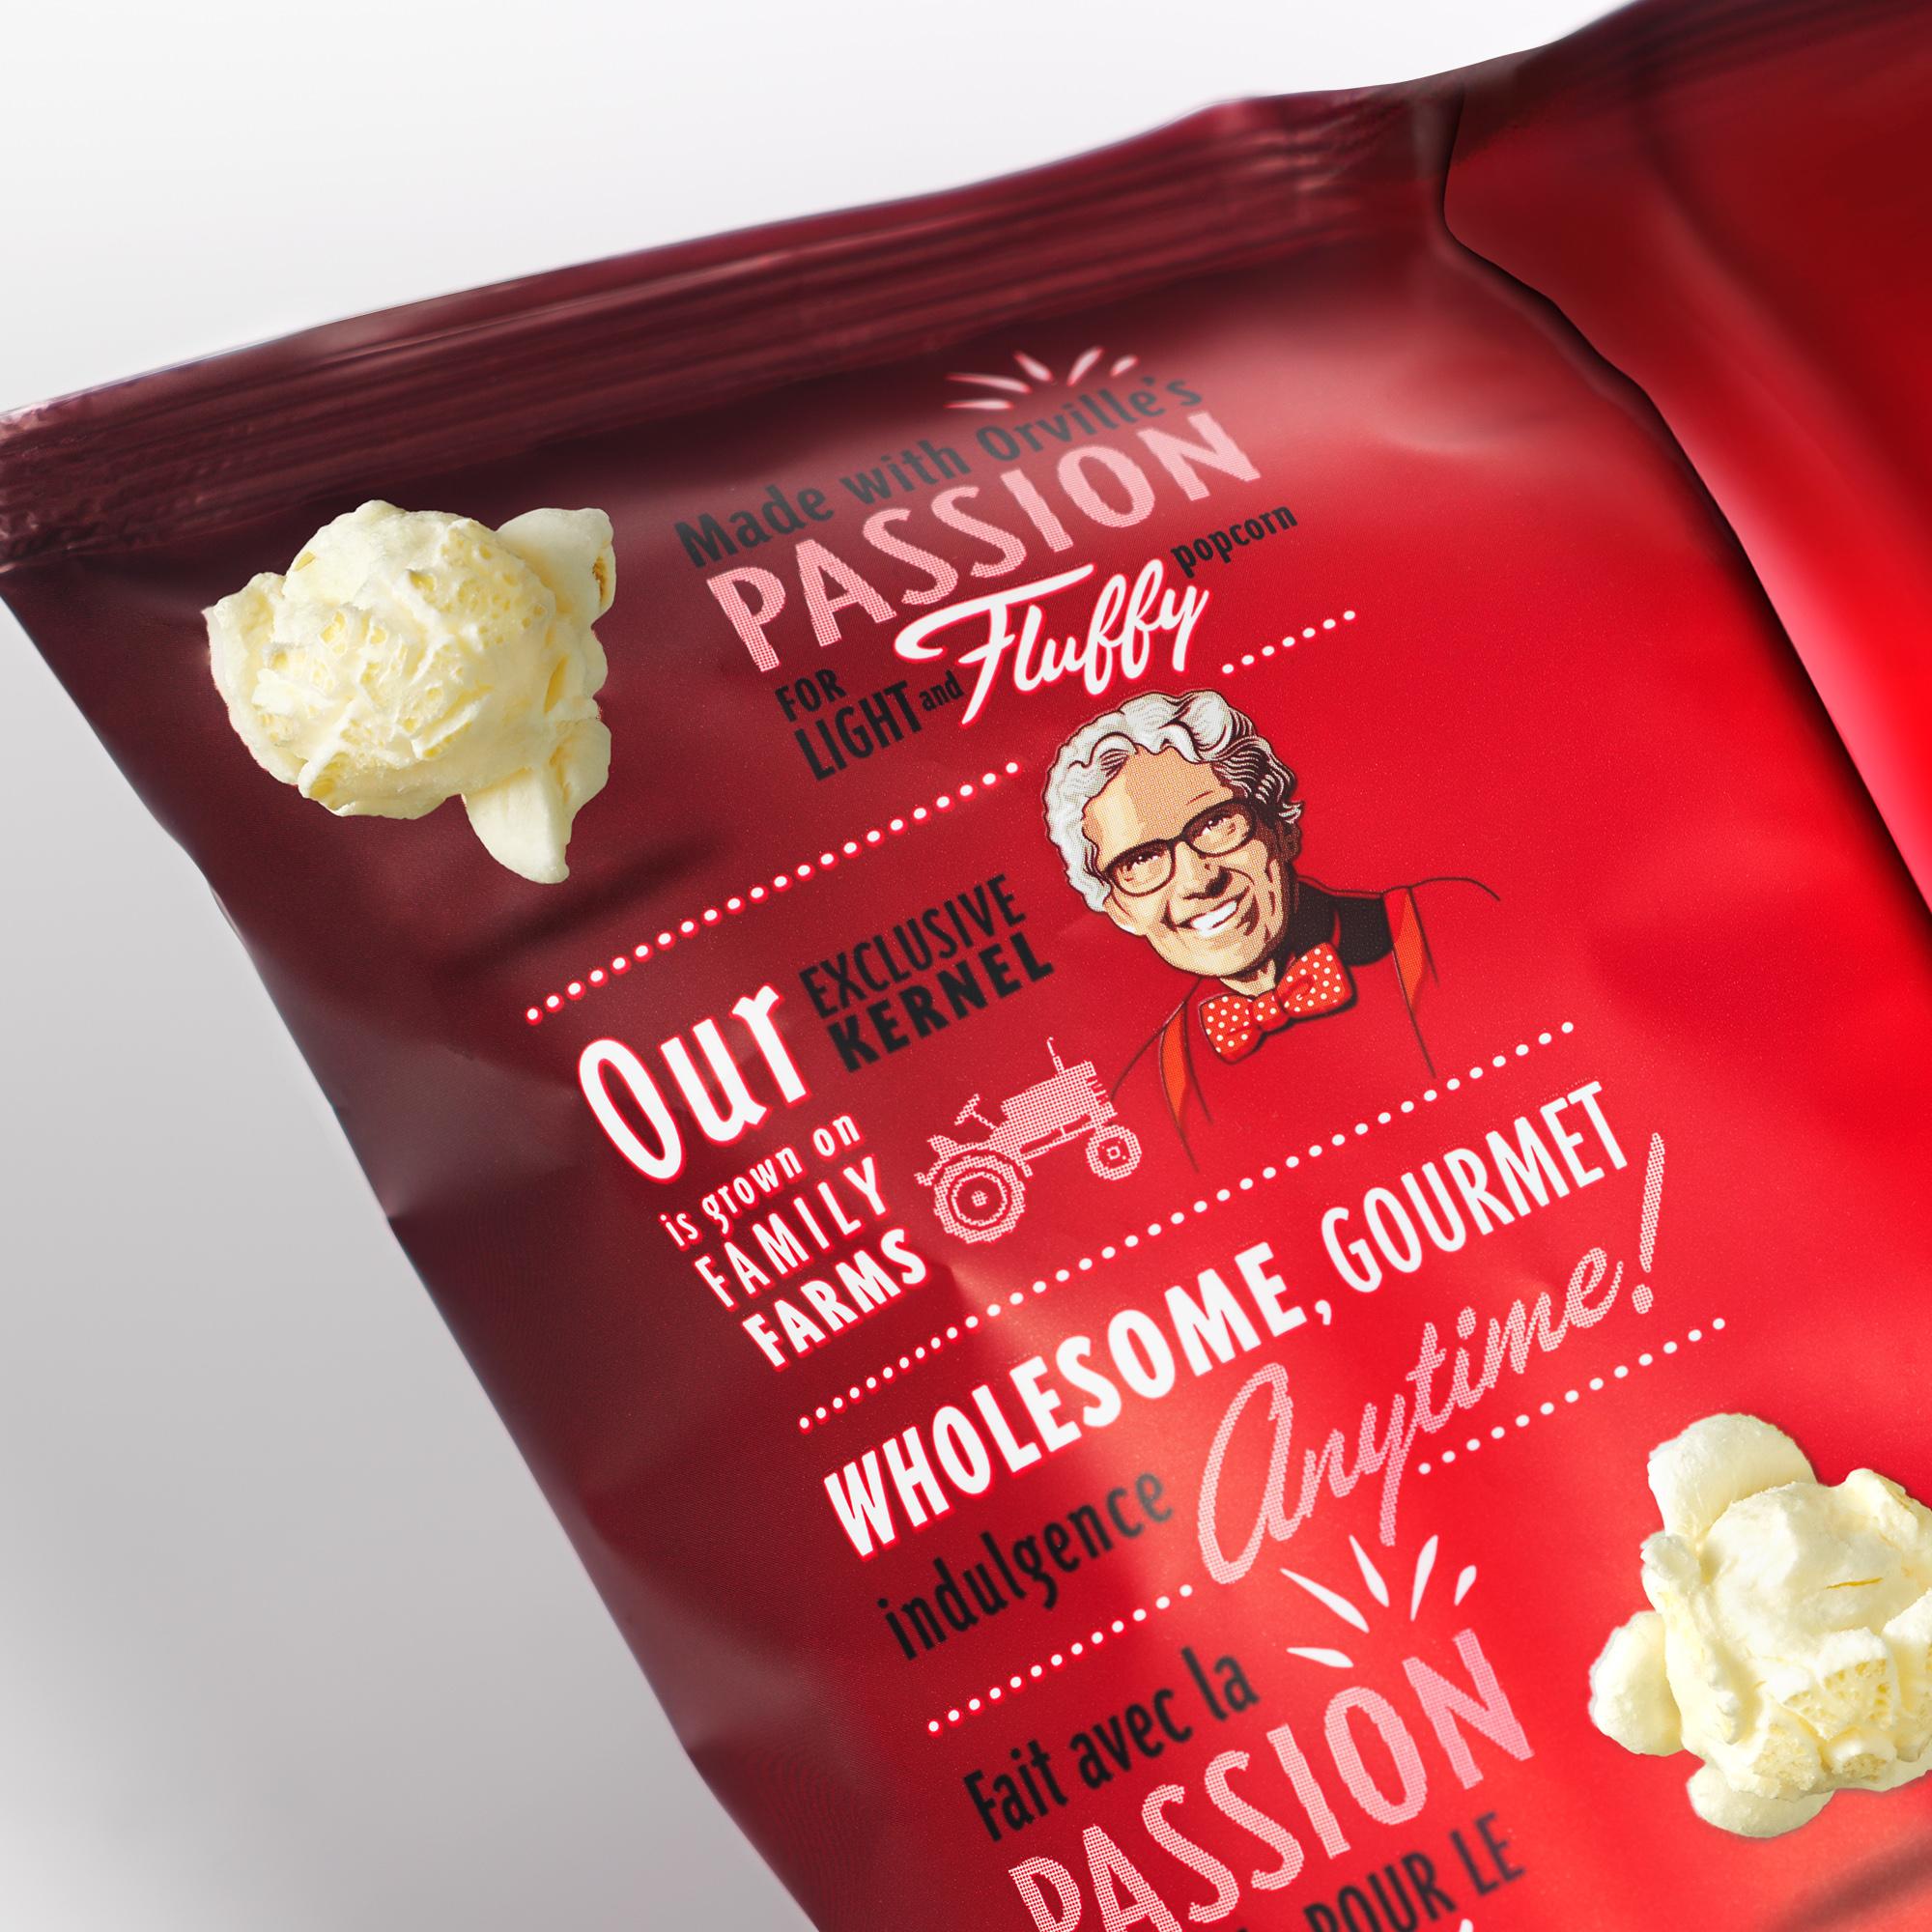 Davis-Design-Agency-Orville-Redenbacher-Popcorn-Package-Design-GDUSA-Awards.jpg